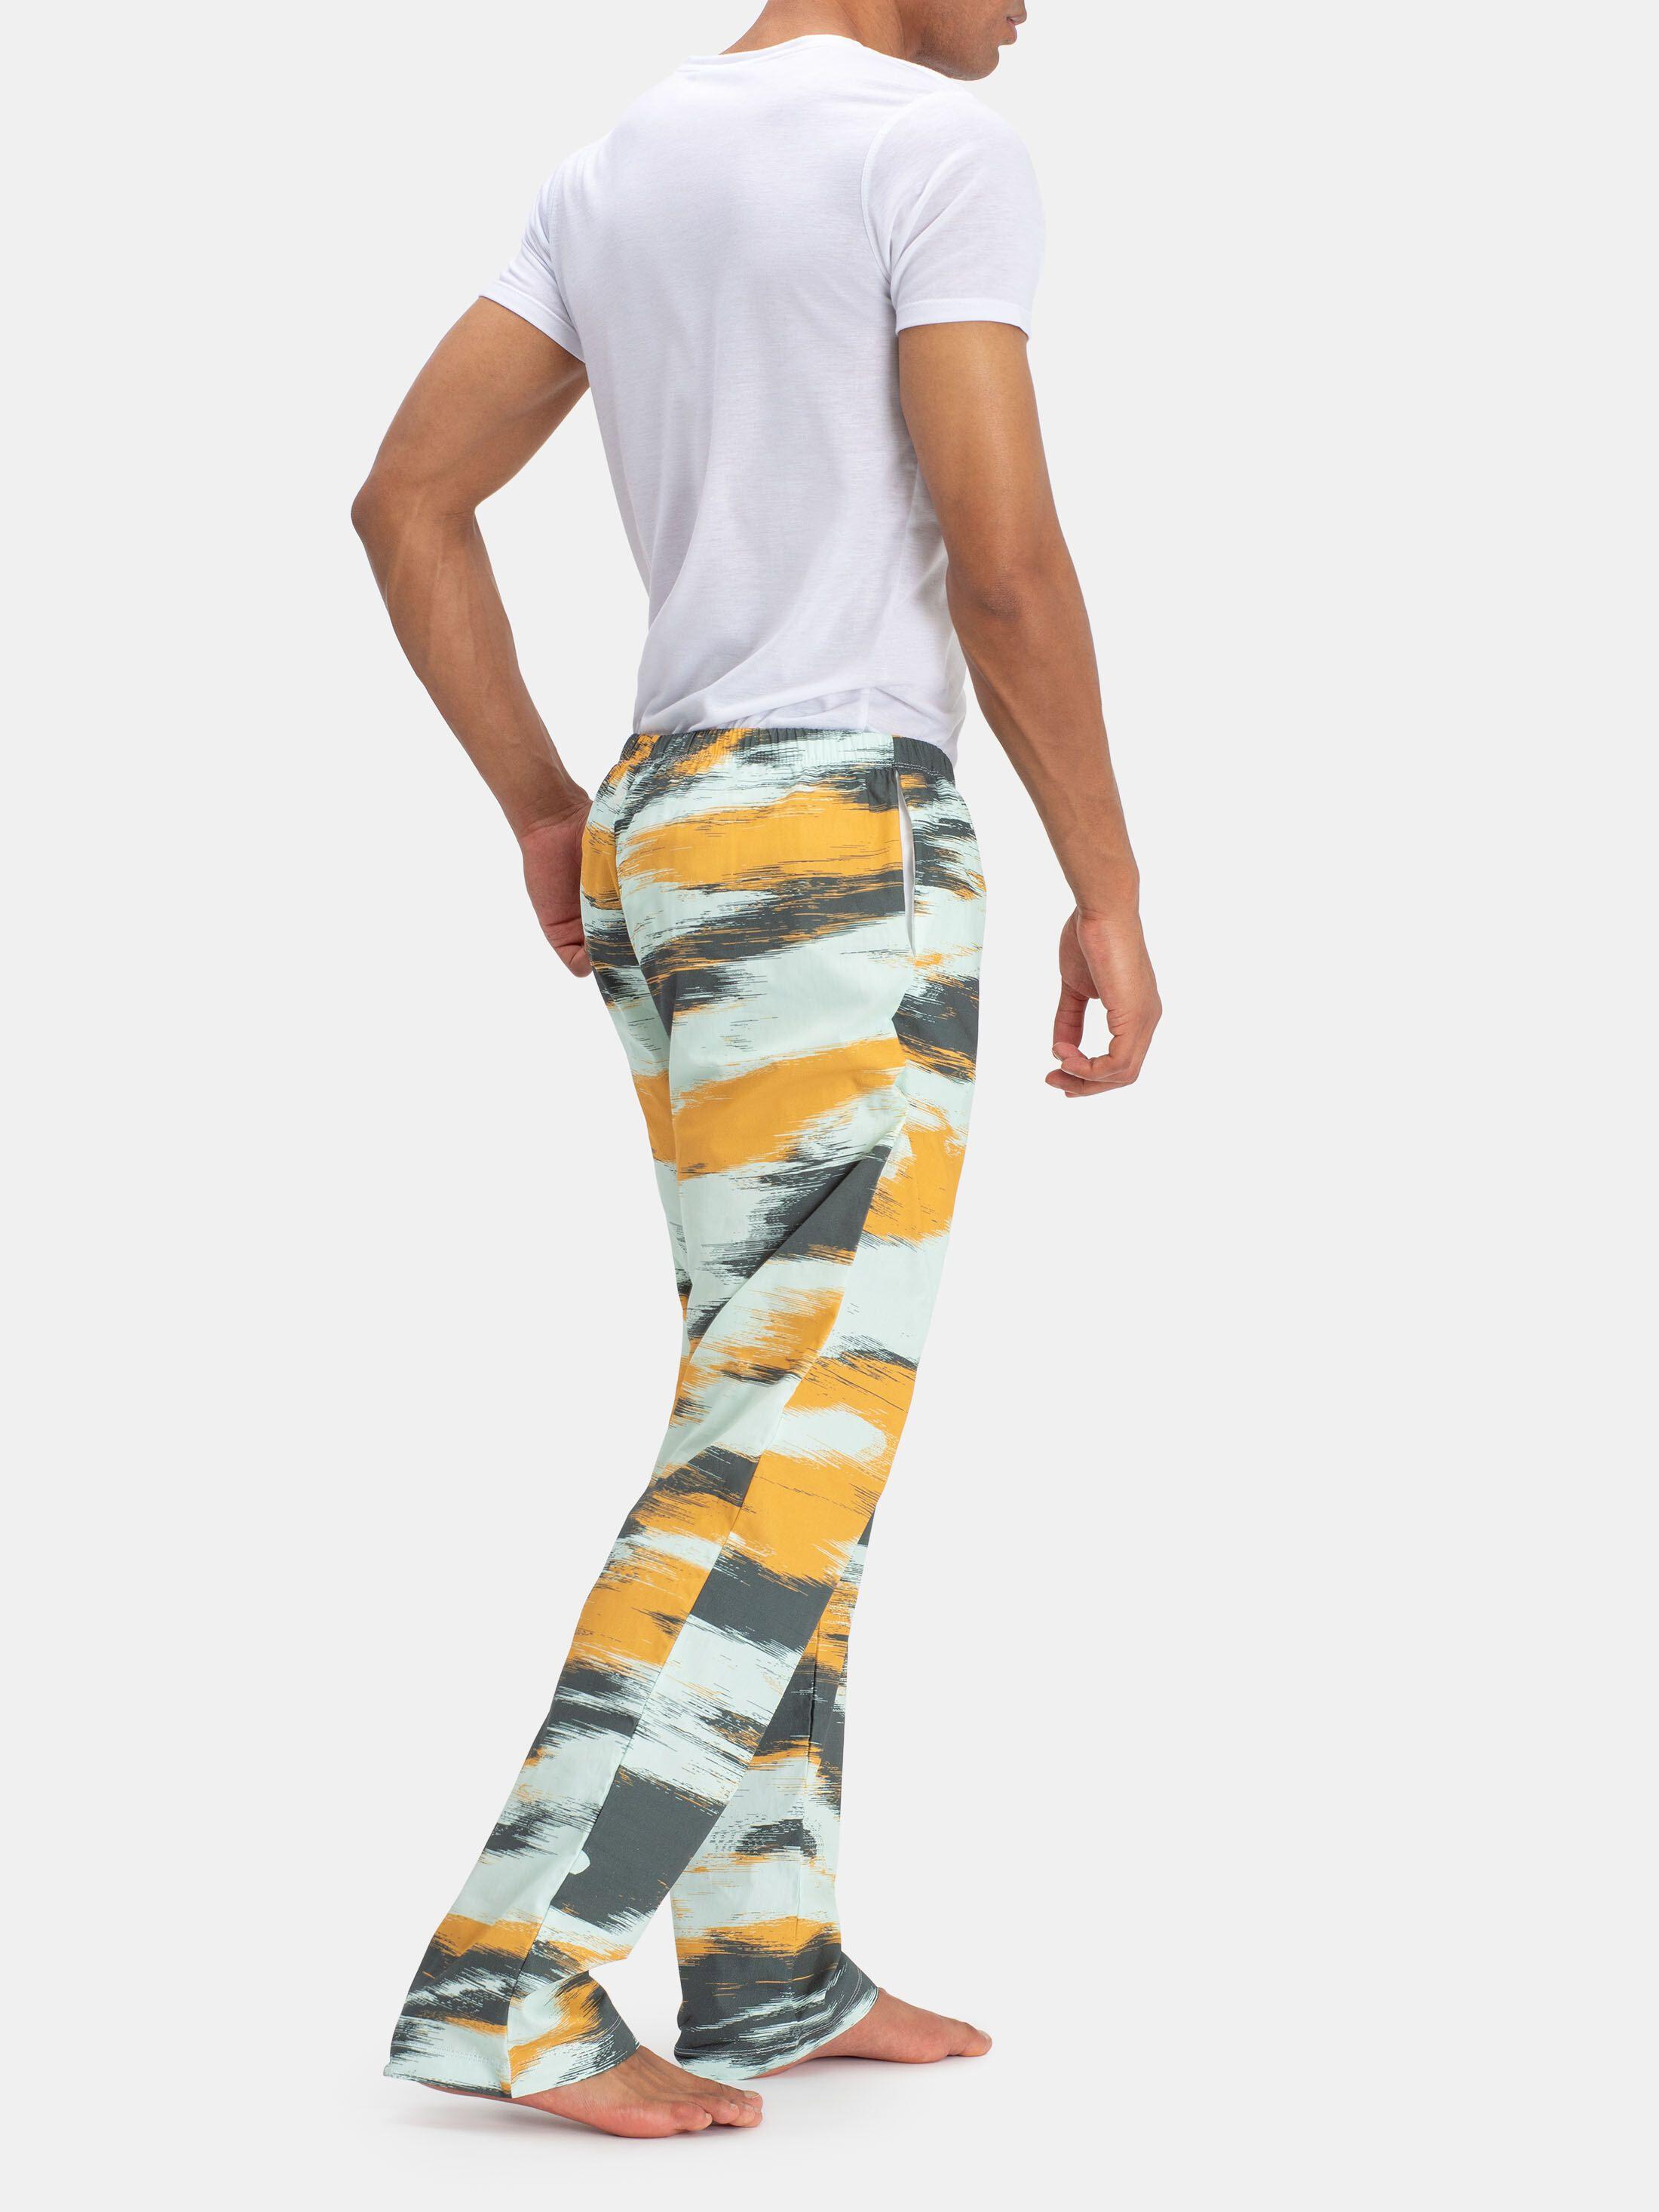 Custom Pajamas for Men